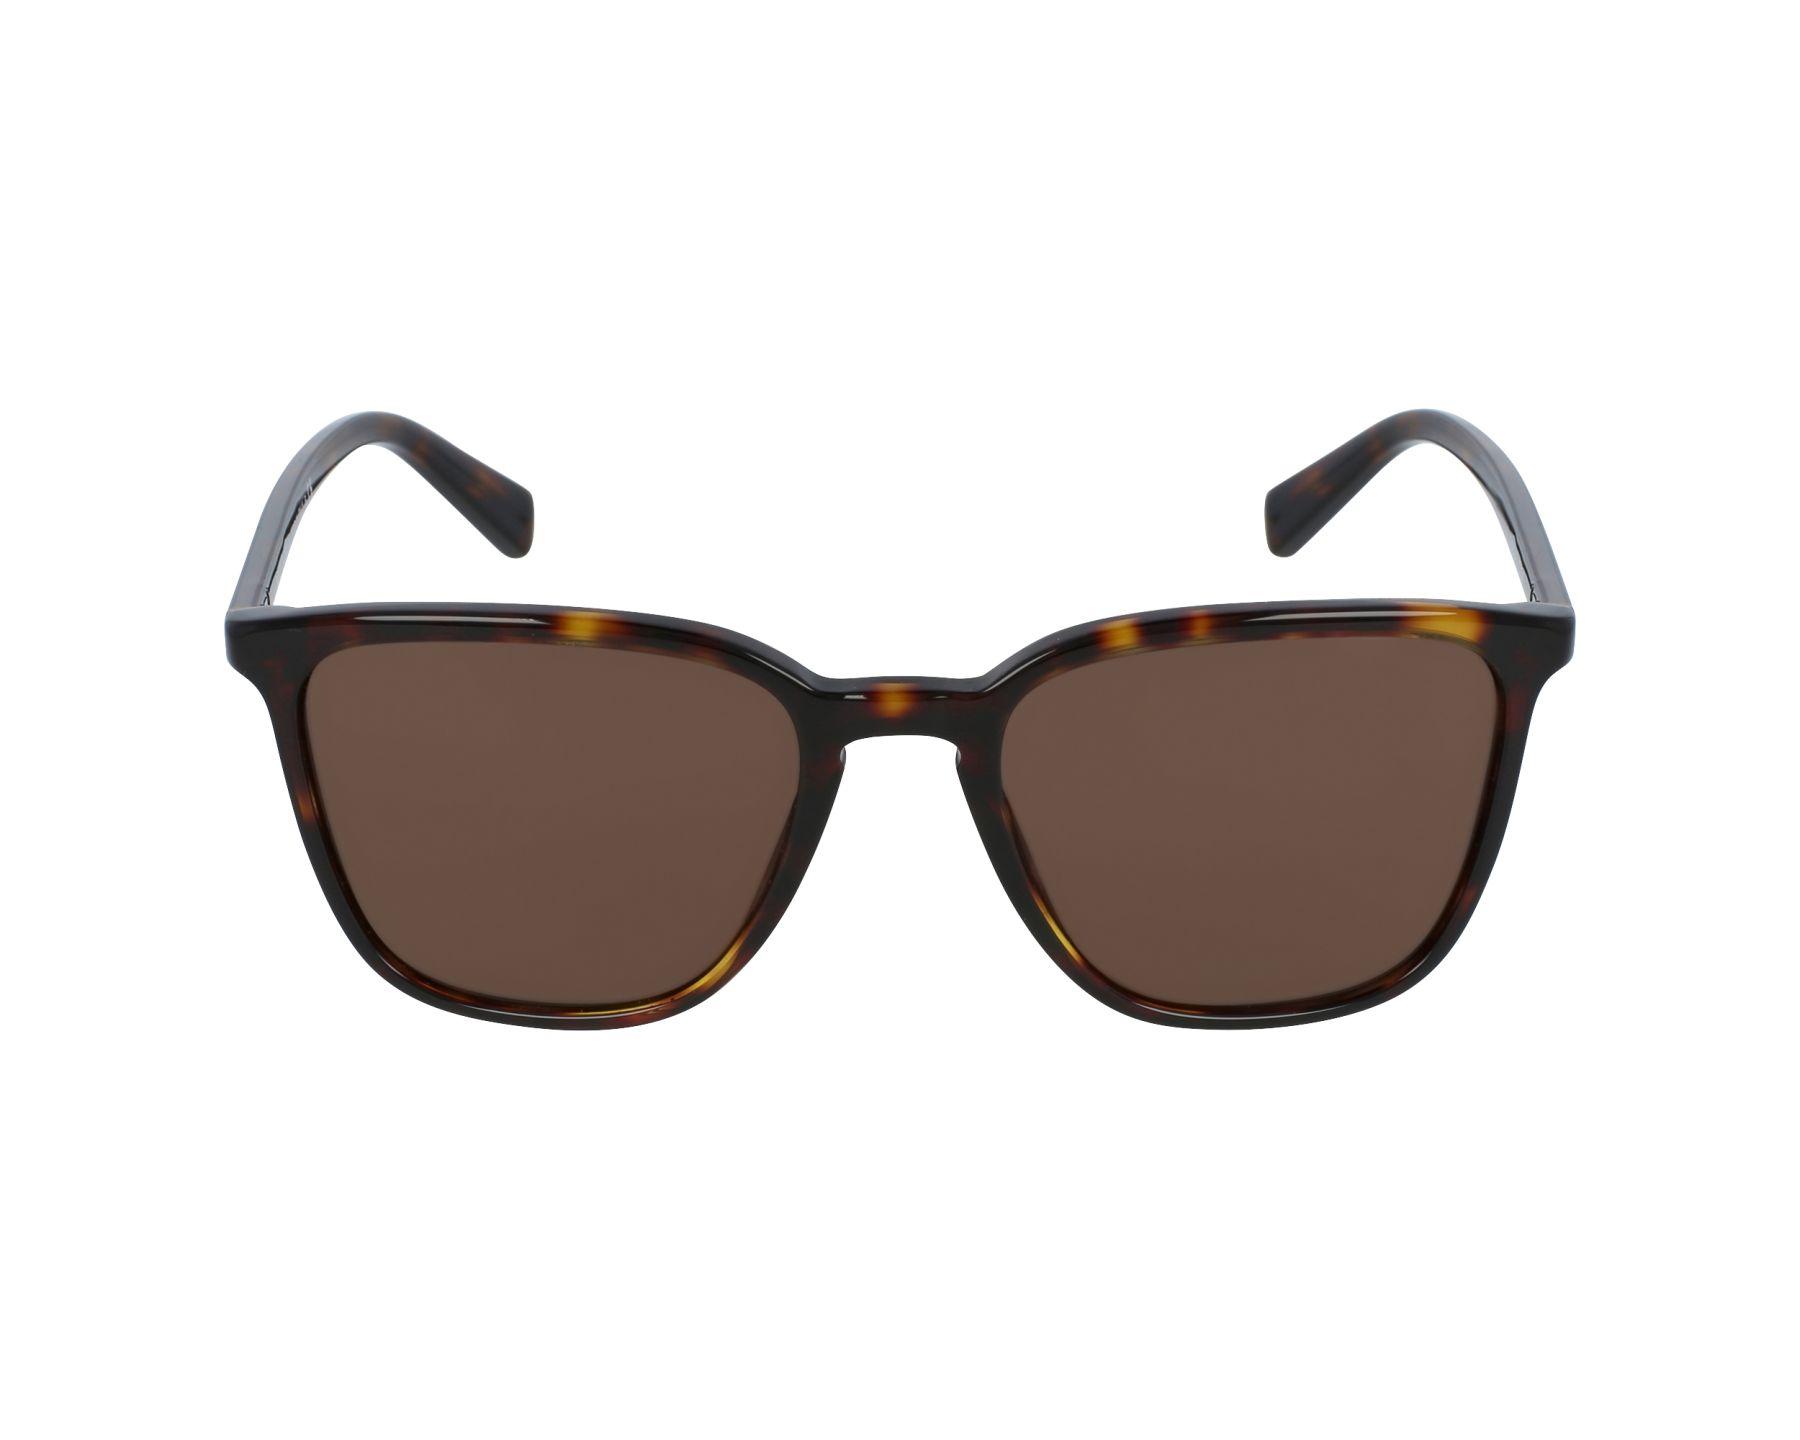 99d4a008e14 Sunglasses Dolce   Gabbana DG-4301 502 73 53-19 Havana profile view